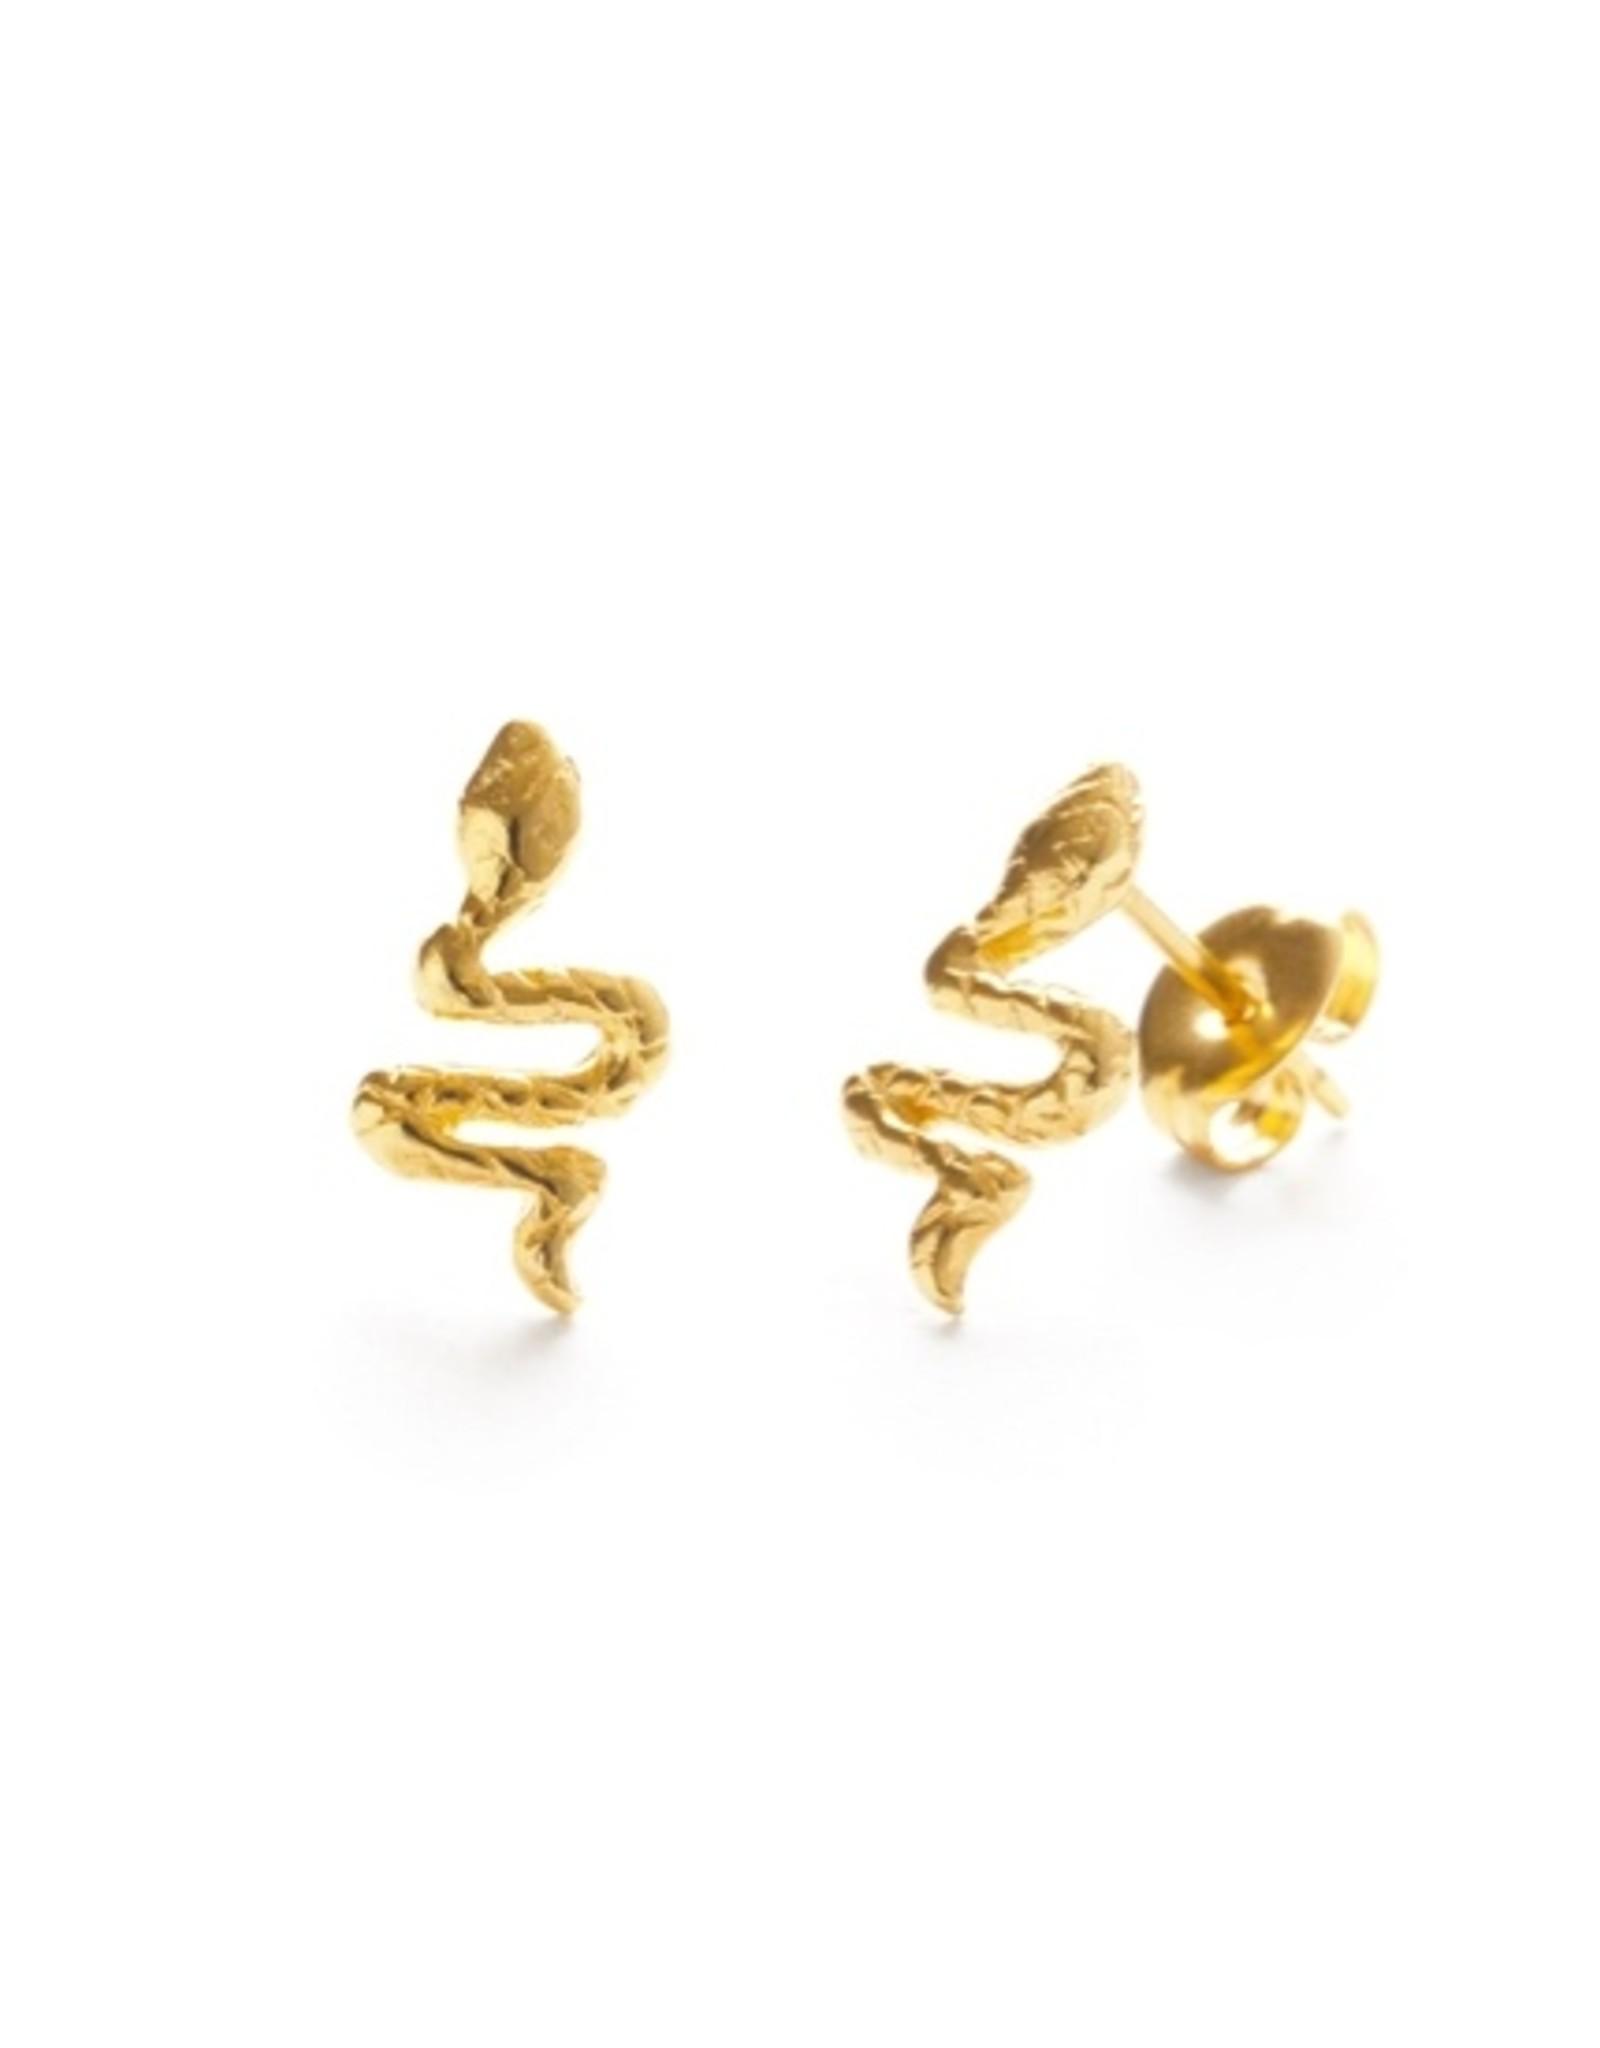 Amano Studio 23BS | Teeny Tiny Serpent Studs